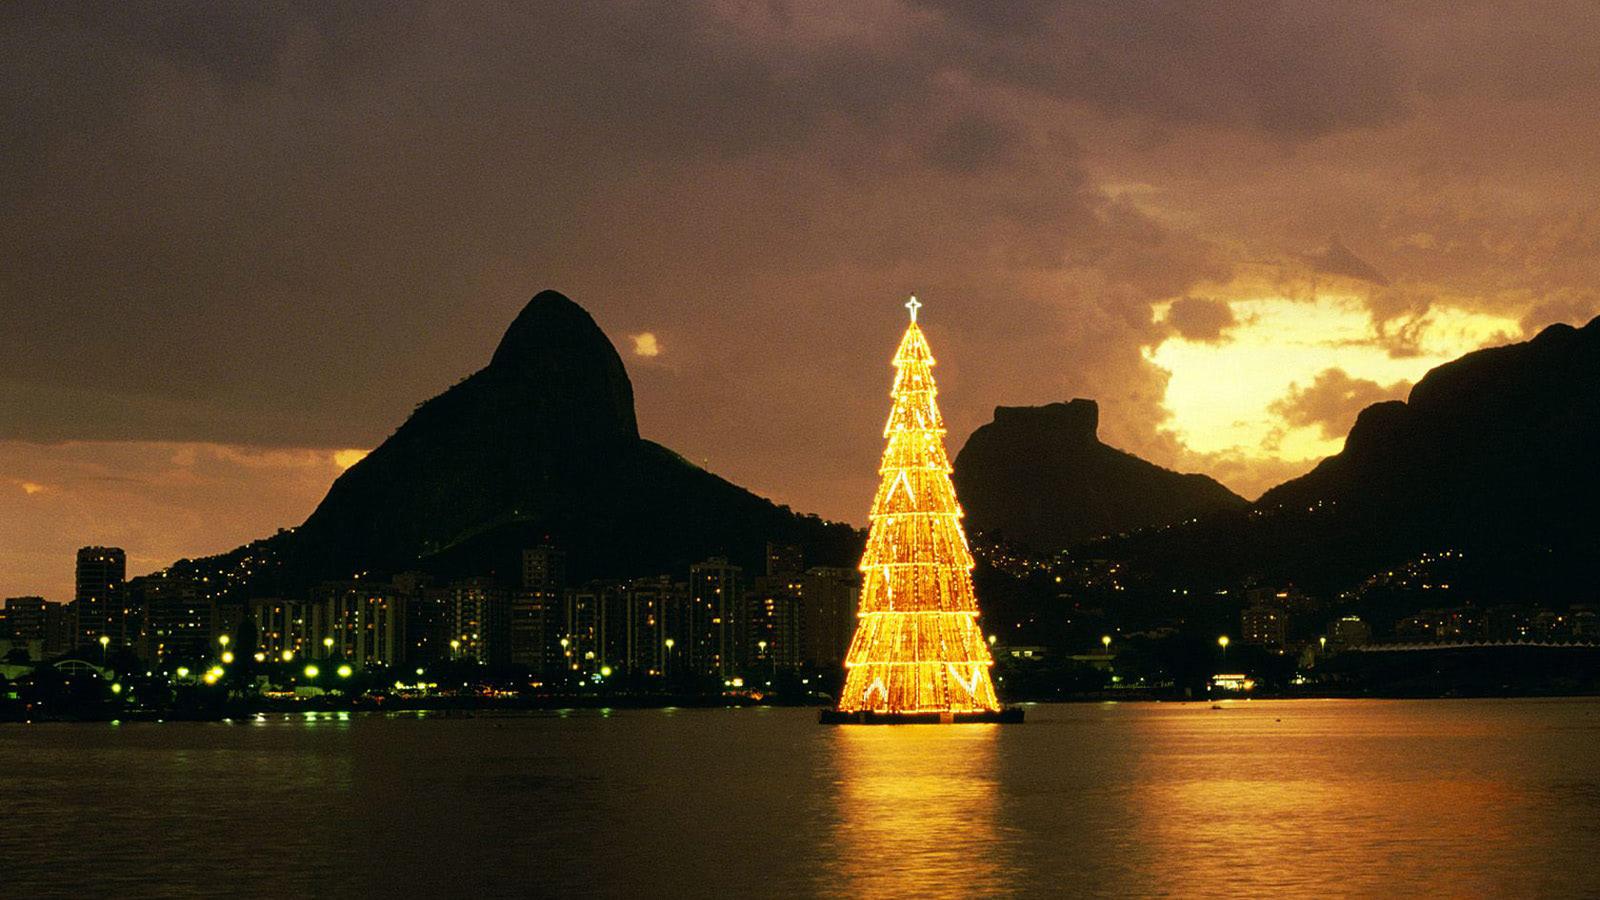 ... de janeiro brazil hd desktop wallpaper high definition mobile pictures